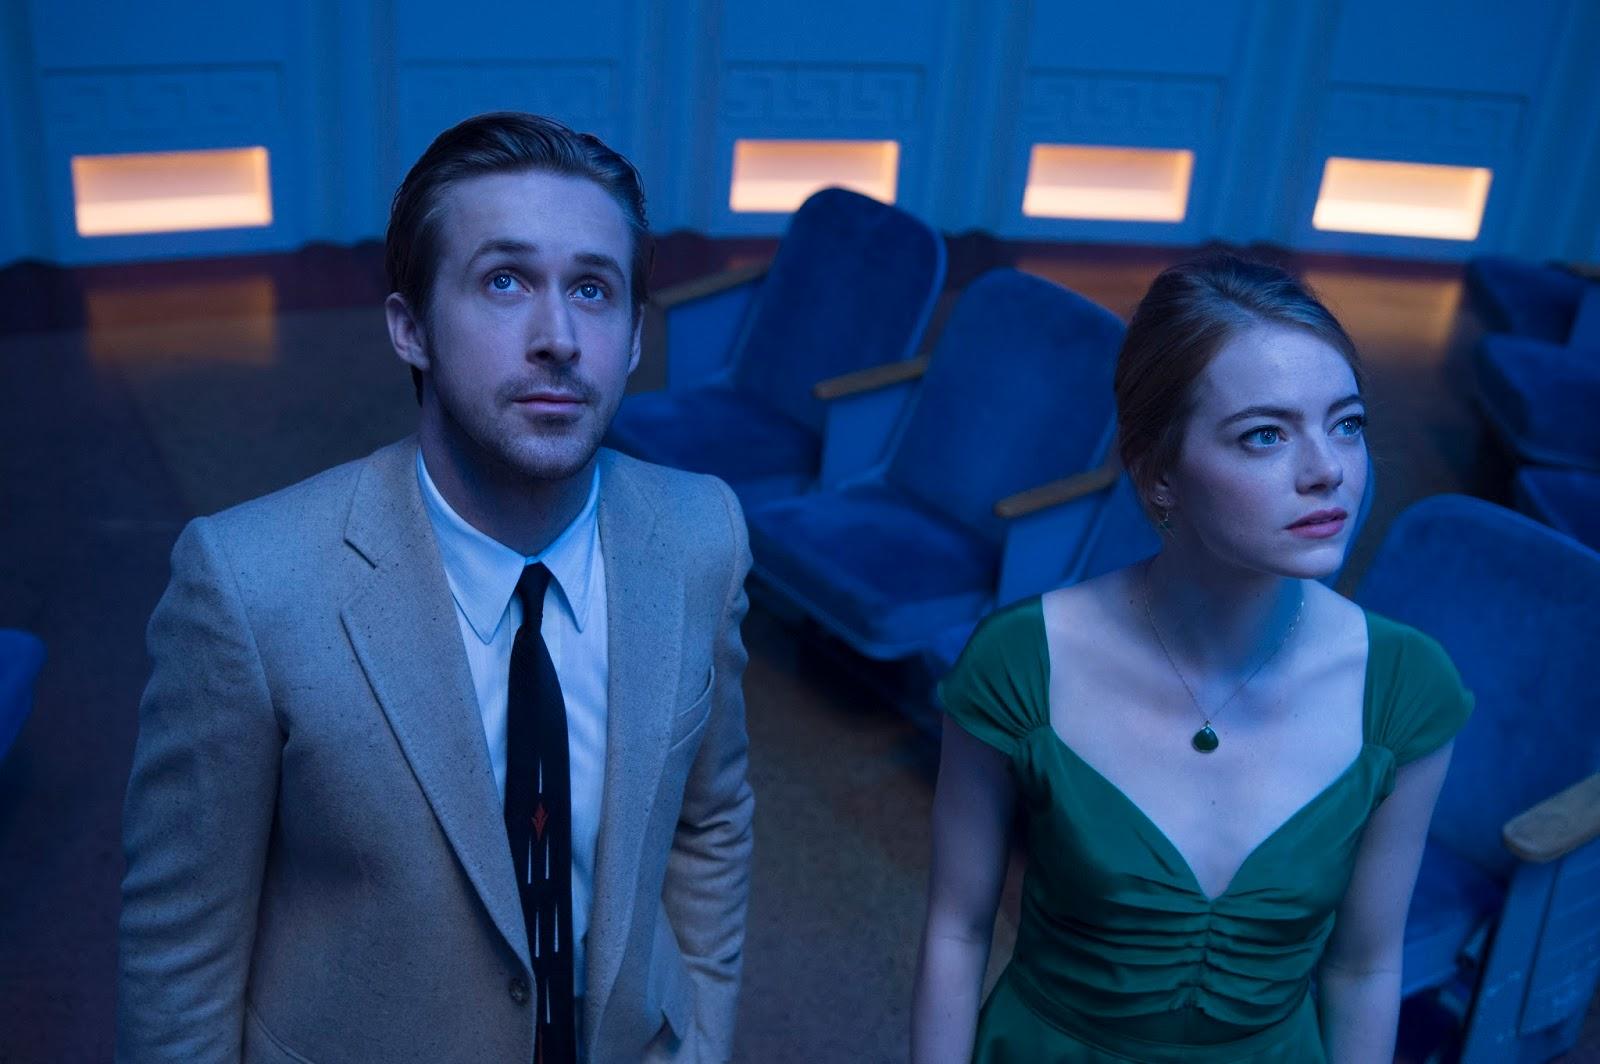 Ryan Gosling y Emma Stone - LaLaLand